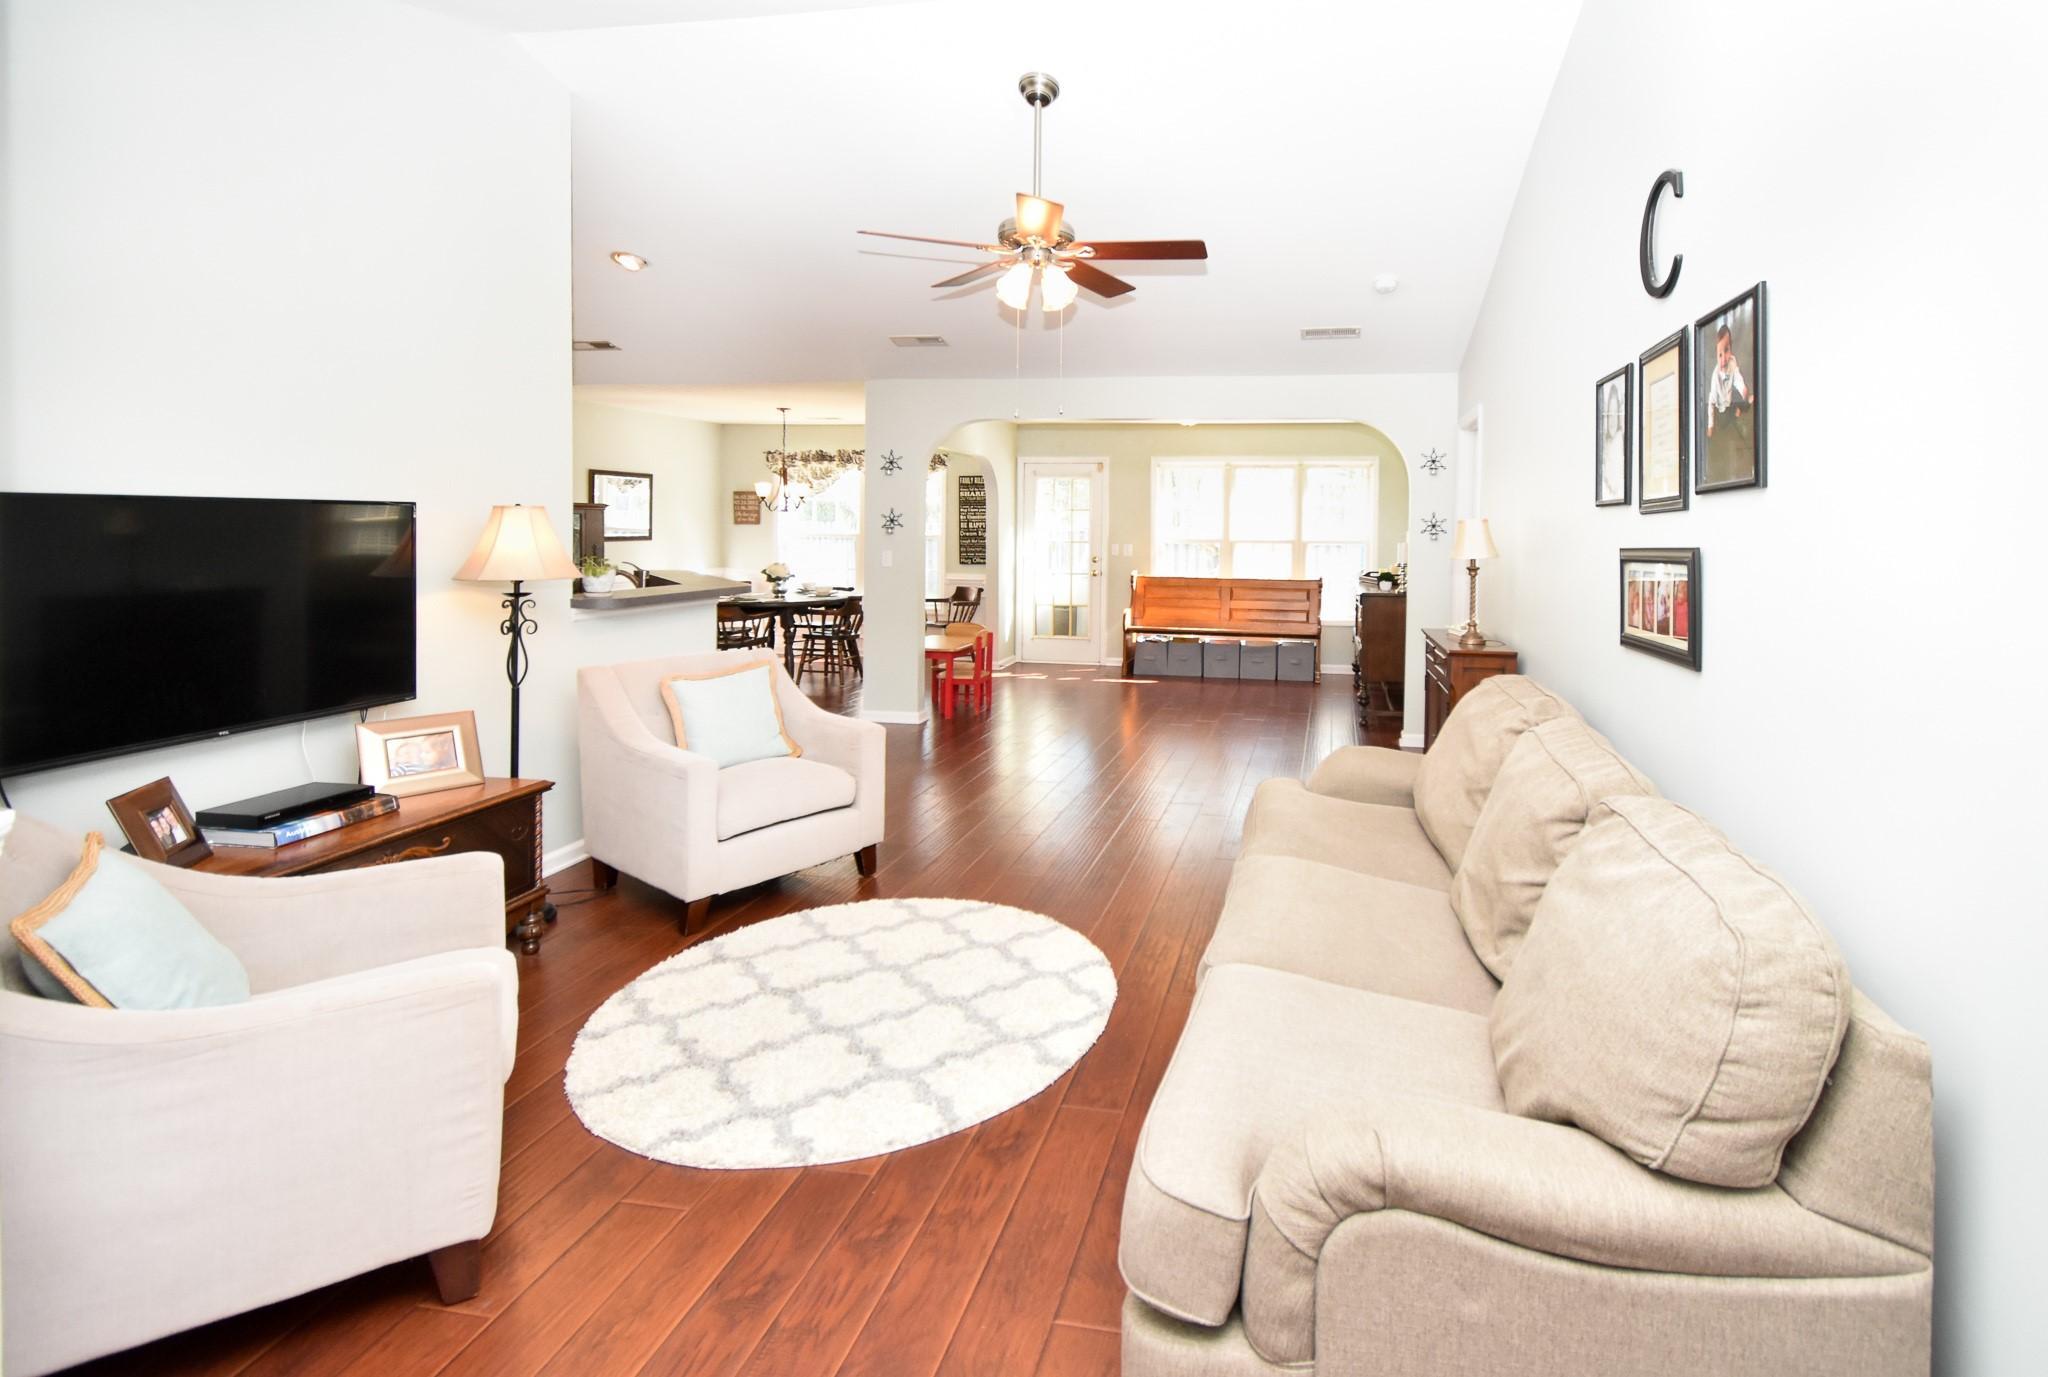 Park West Homes For Sale - 1444 Wellesley, Mount Pleasant, SC - 11